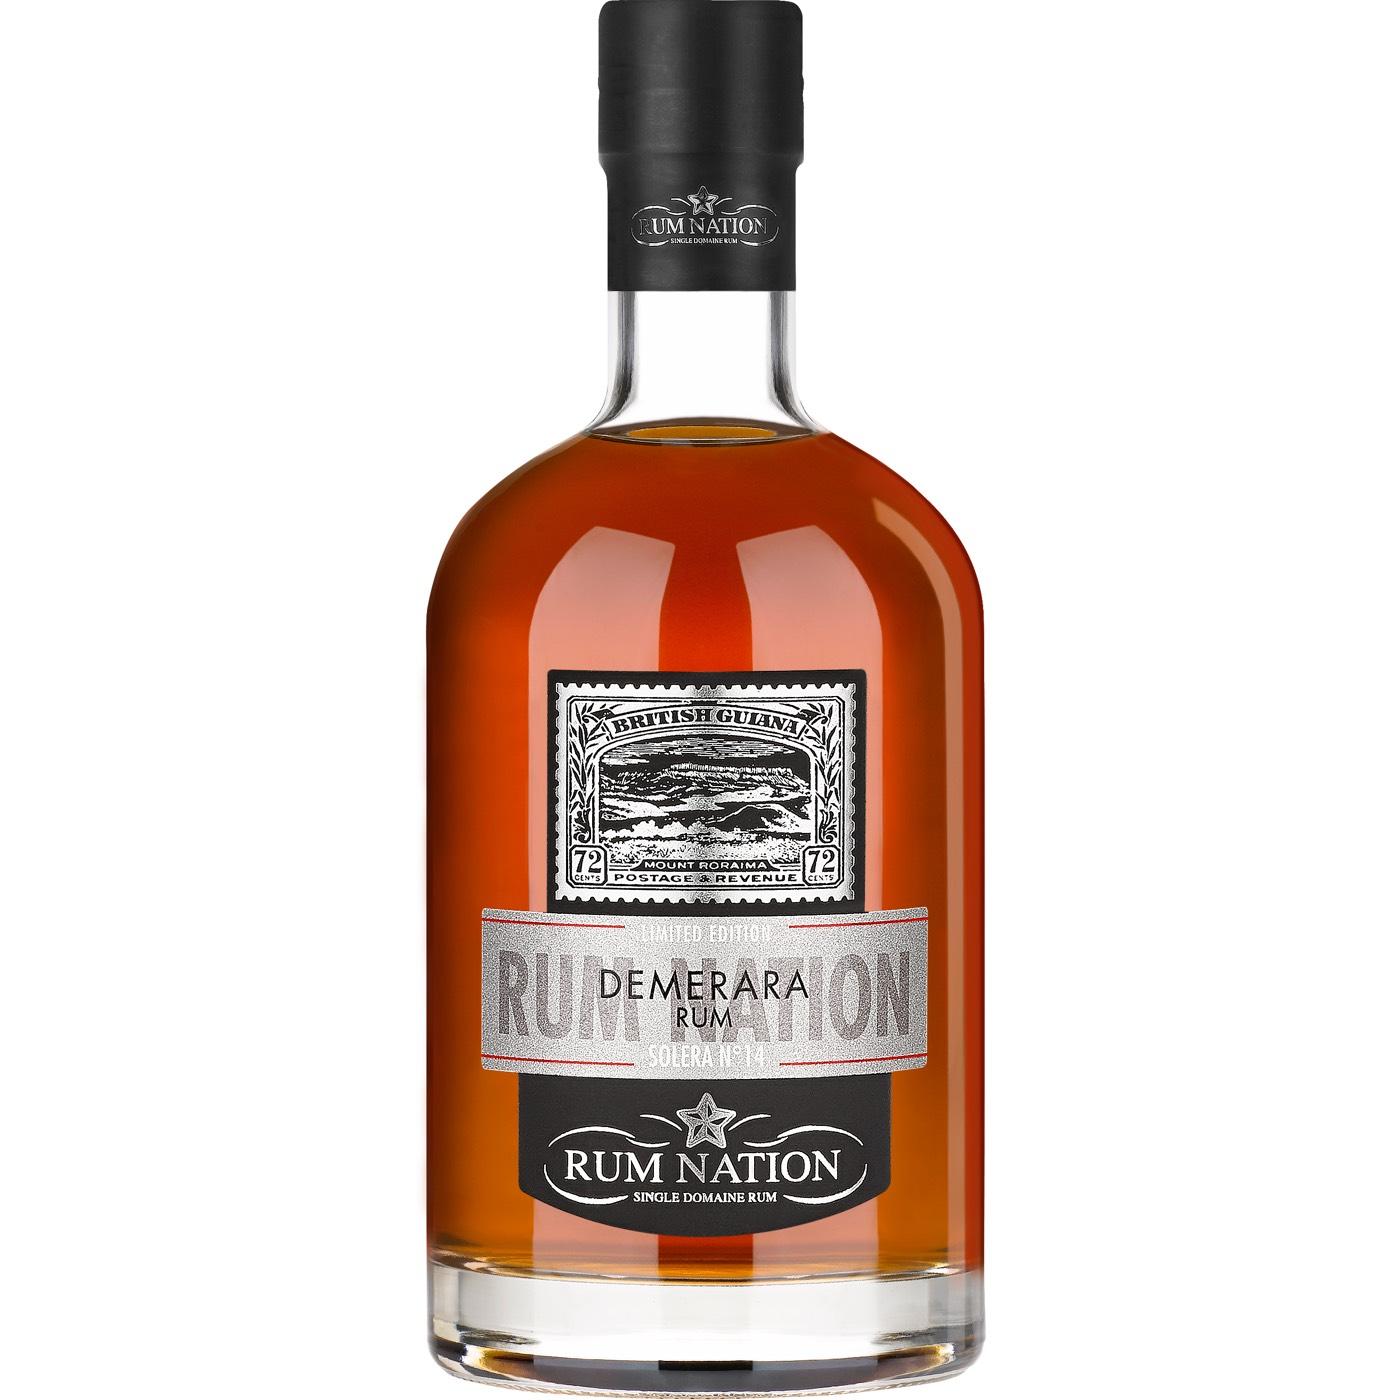 Bottle image of Demerara Rum Solera No.14 2019